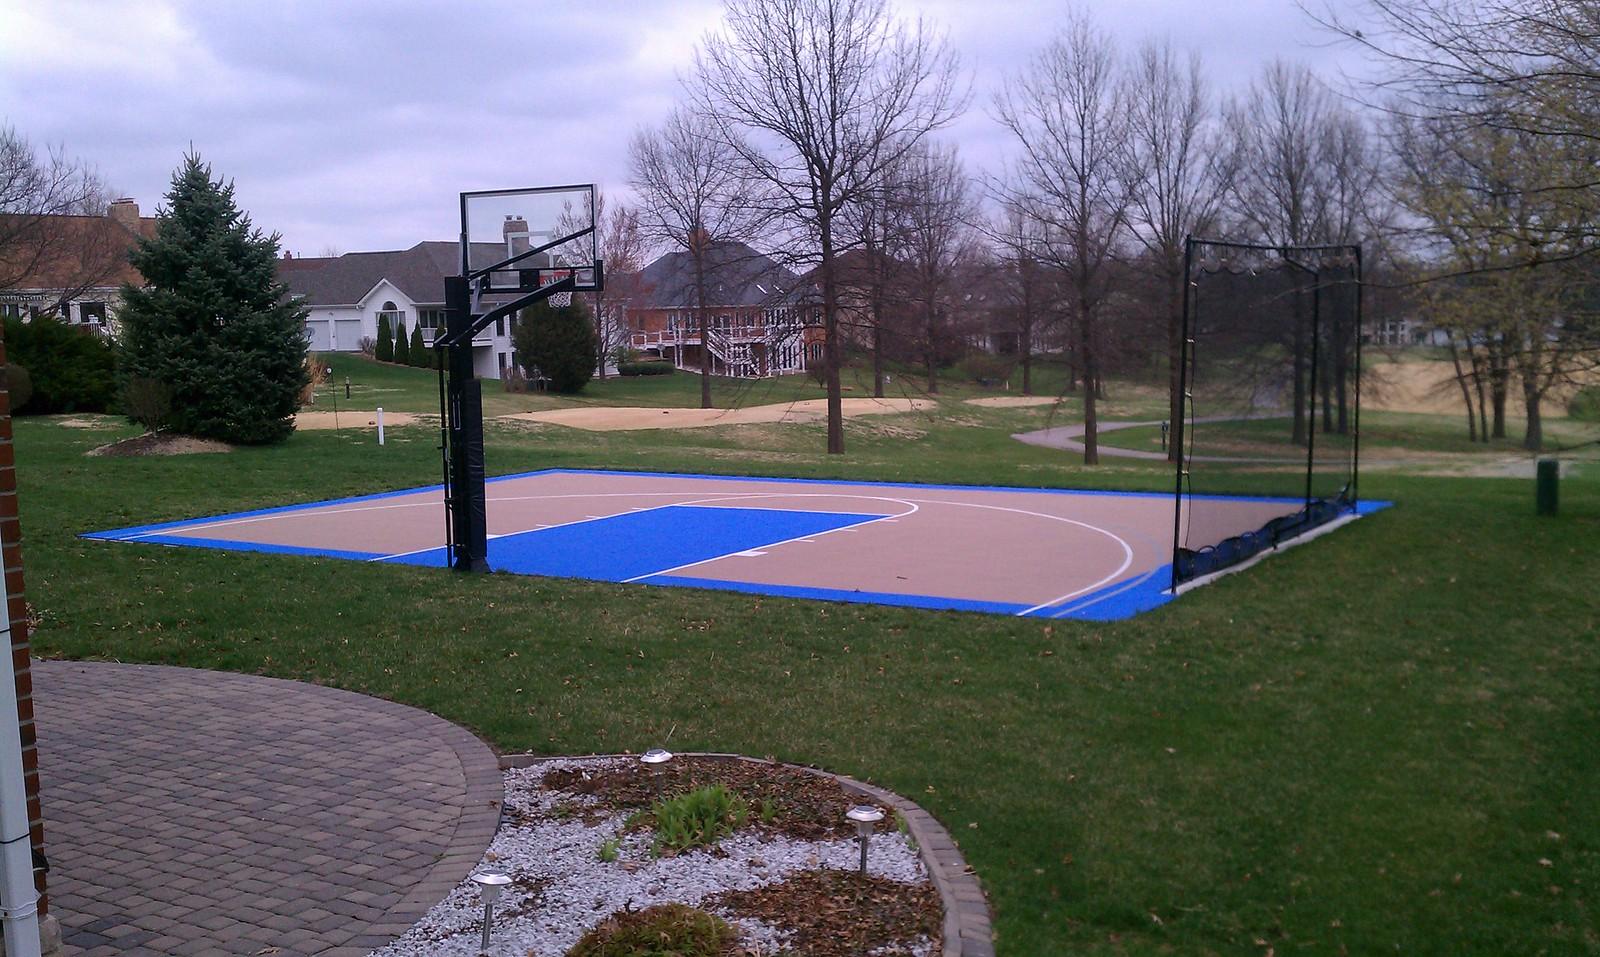 Backyard basketball half court dimensions 2017 2018 for Home basketball court size